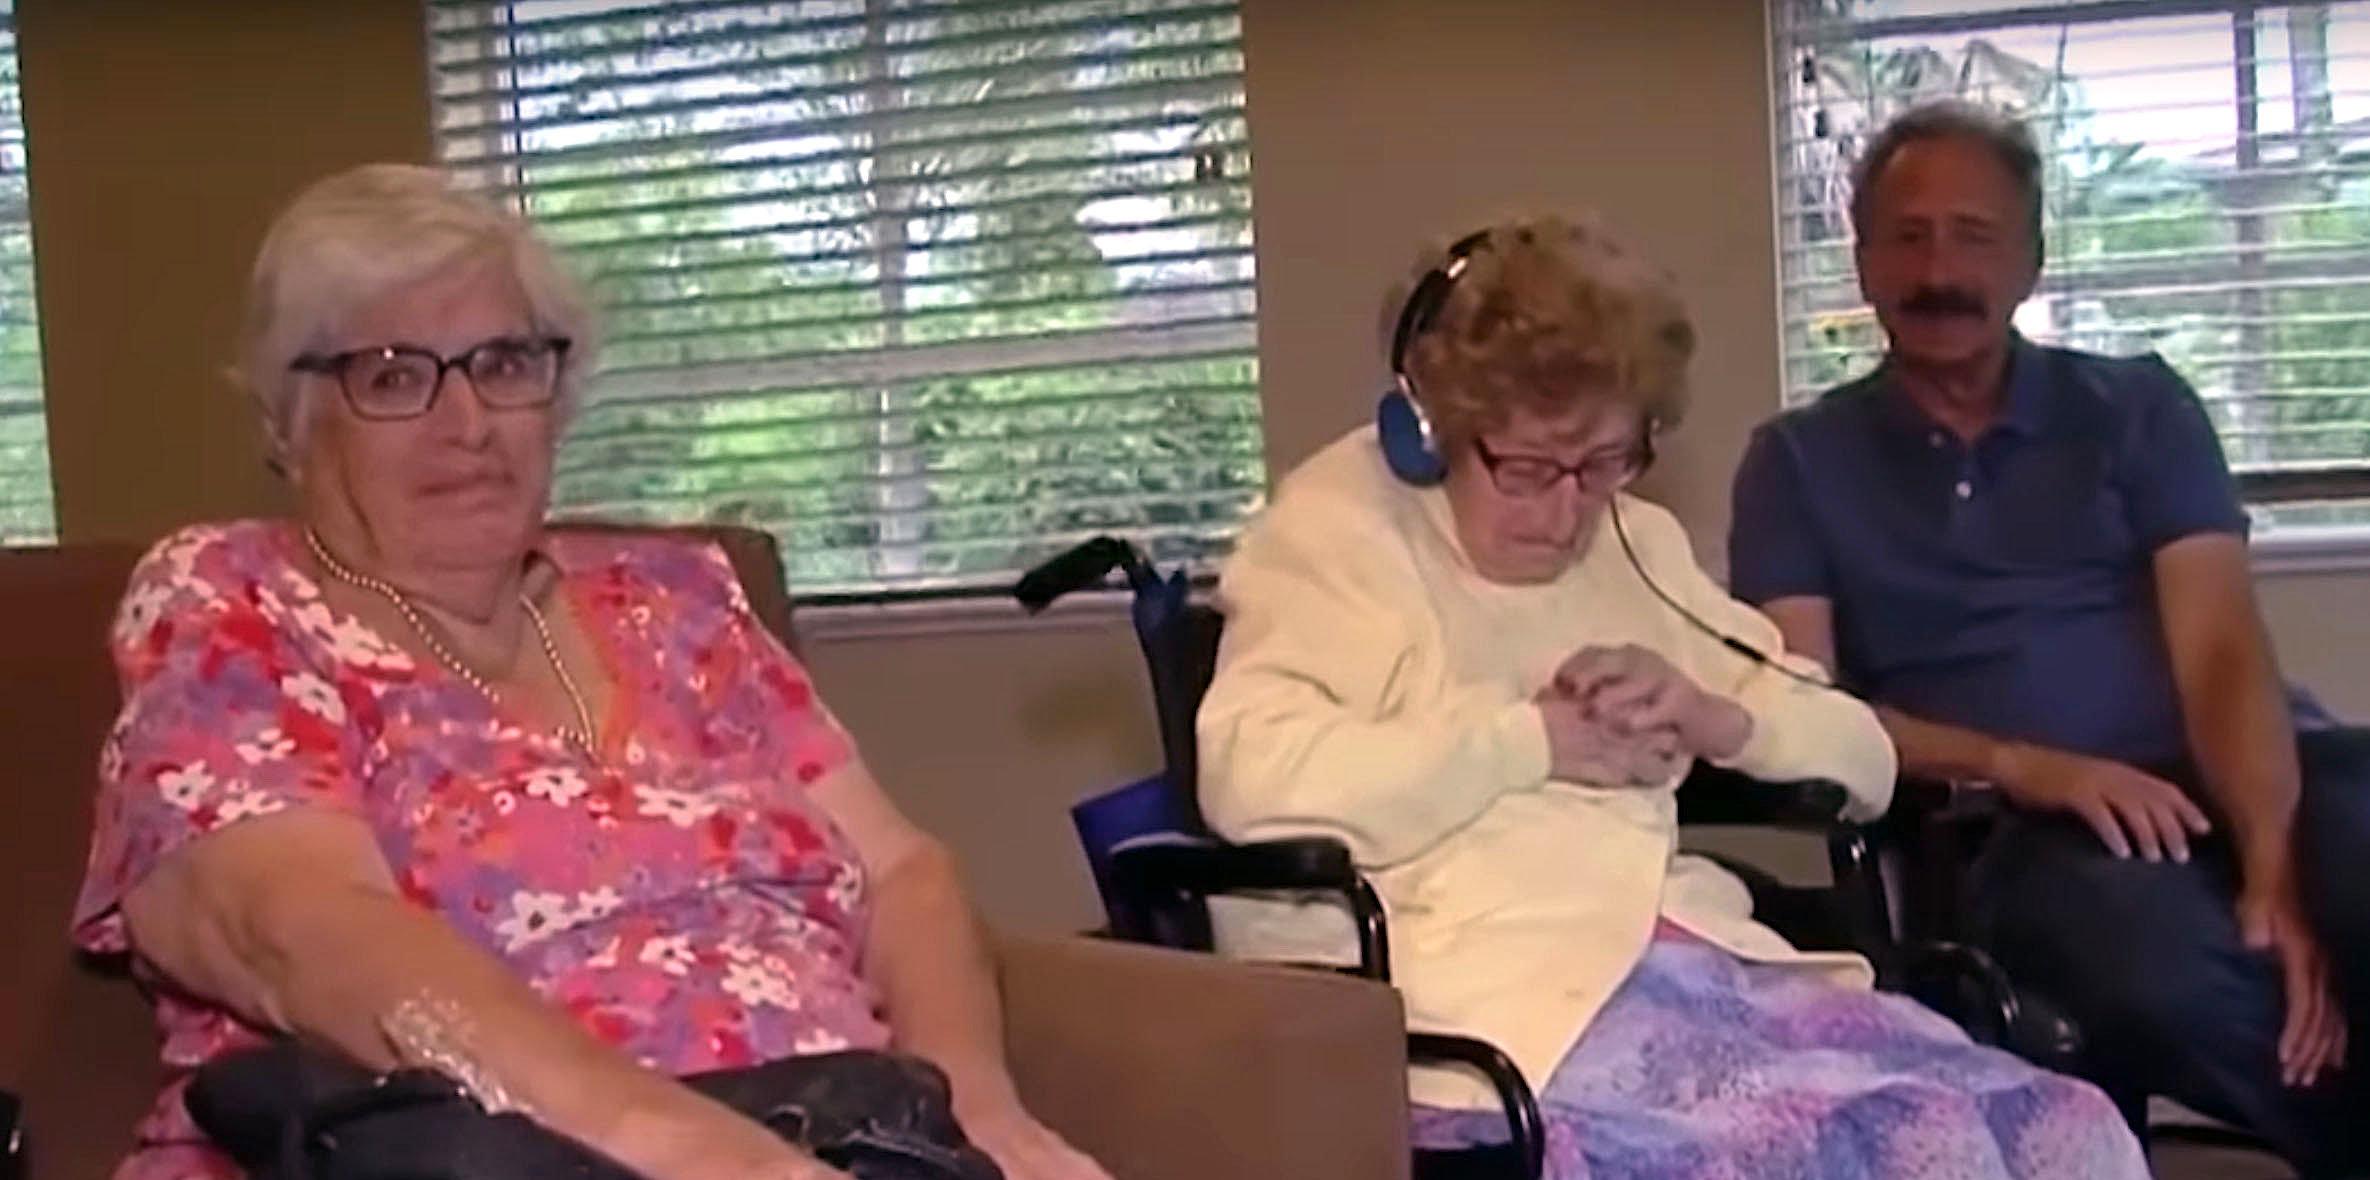 Joanne Loewenstern 79 found her 100-year-old mother Lillian Ciminieri